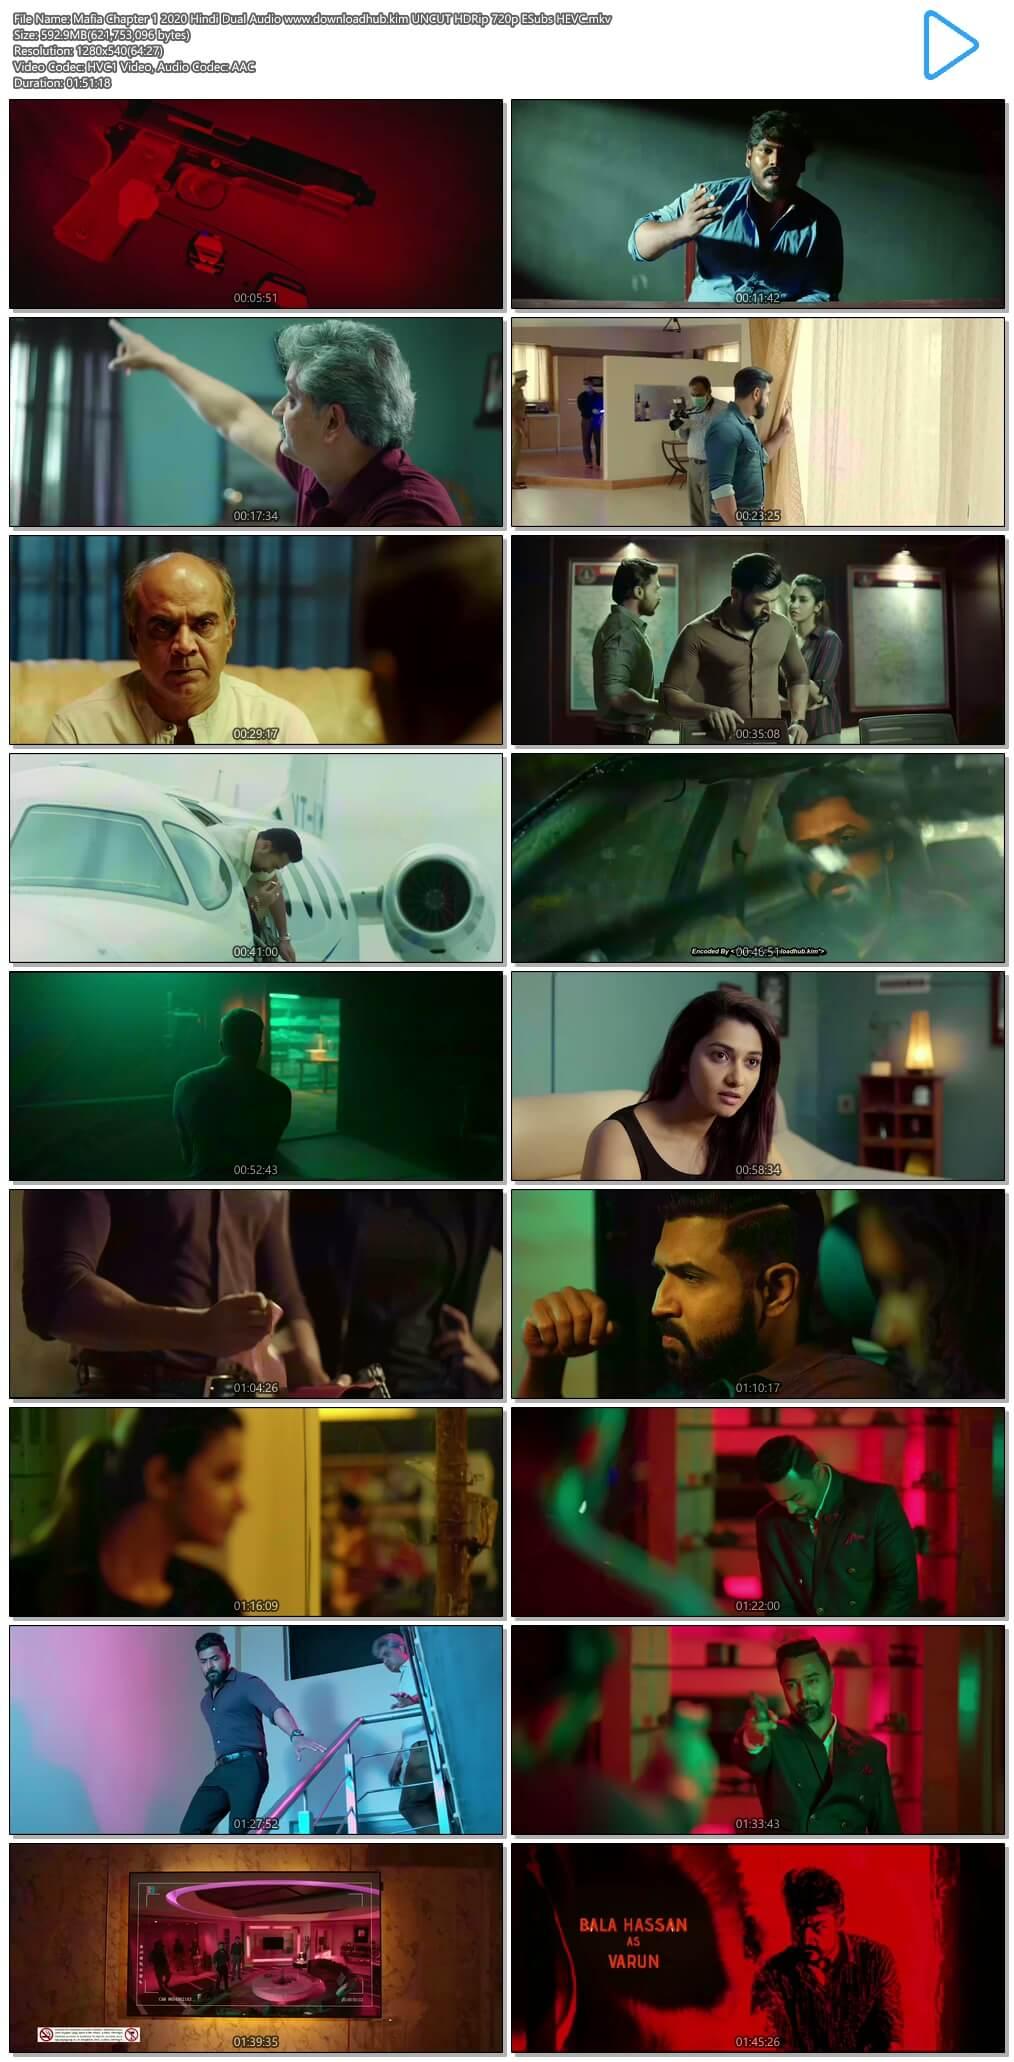 Mafia Chapter 1 2020 Hindi Dual Audio 600MB UNCUT HDRip 720p ESubs HEVC